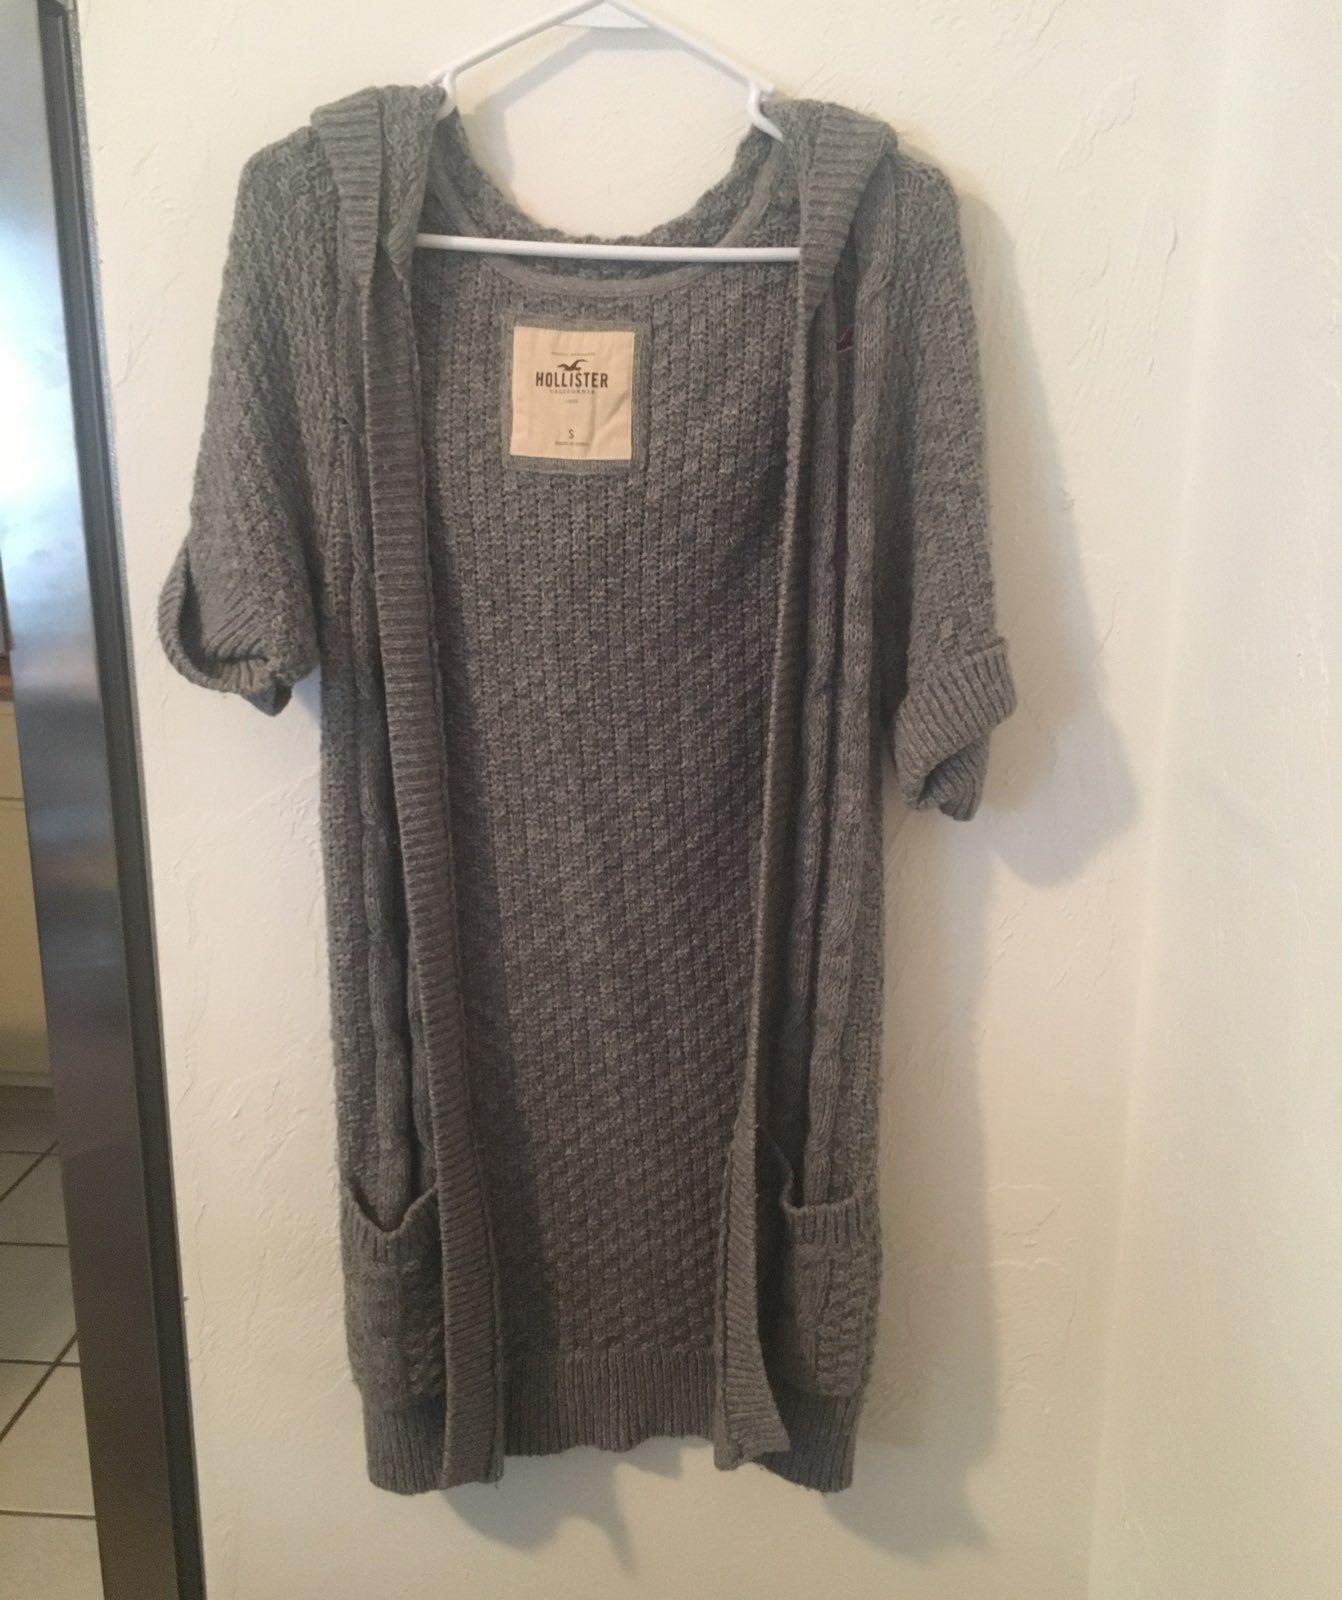 Gray Short Sleeve Cardigan Size Small - Mercari: BUY & SELL THINGS ...